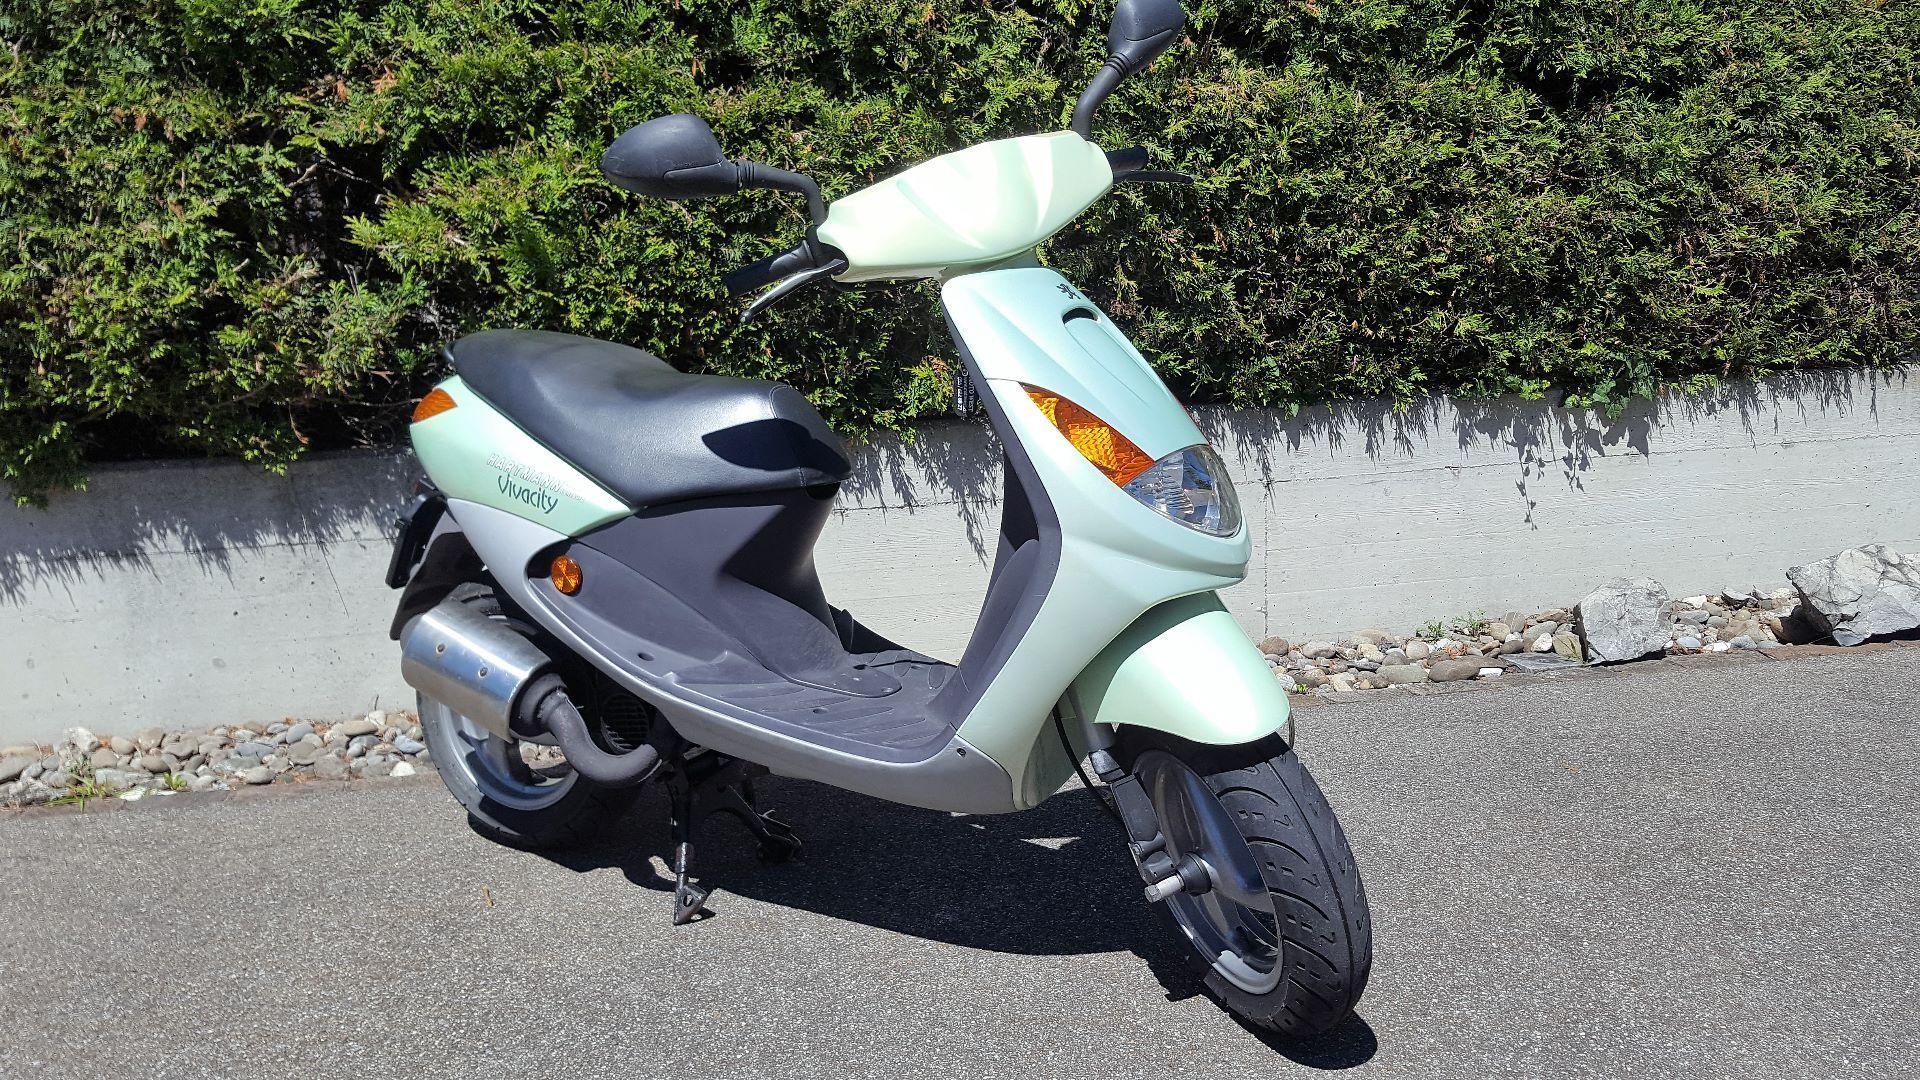 motorrad occasion kaufen peugeot vivacity 50 moto west. Black Bedroom Furniture Sets. Home Design Ideas